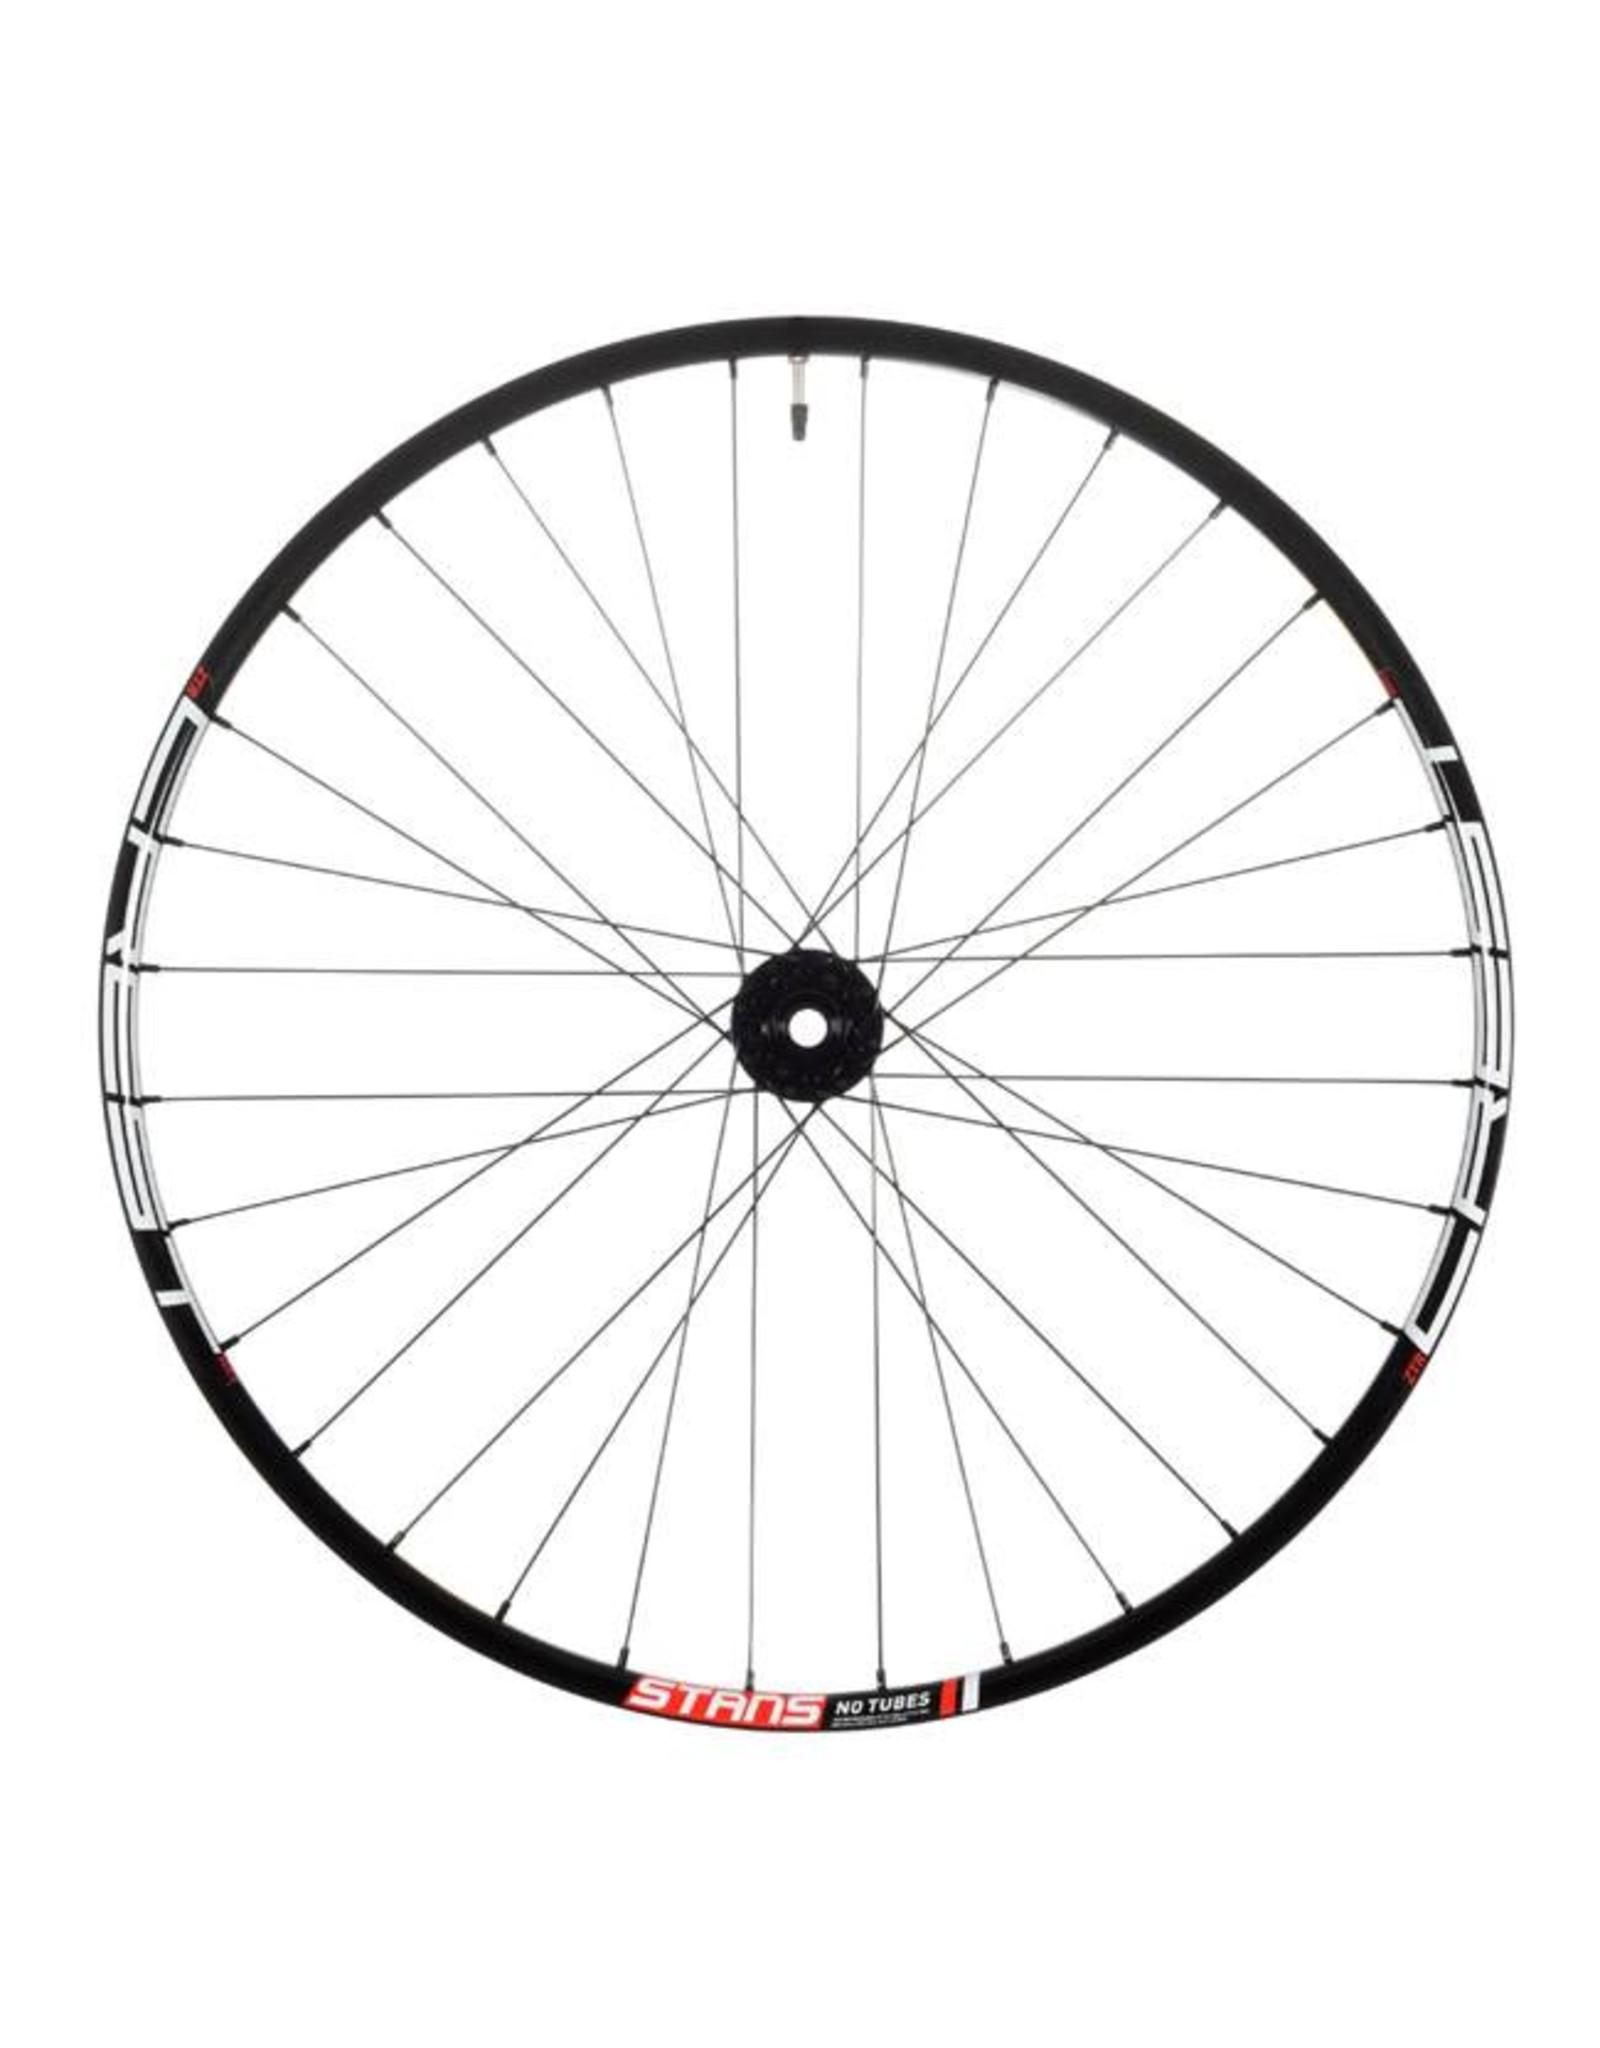 "Stan's No Tubes Stan's No Tubes Crest MK3 Front Wheel: 29"" Alloy, 15 x 110mm Boost, 6- Bolt Disc, Black"